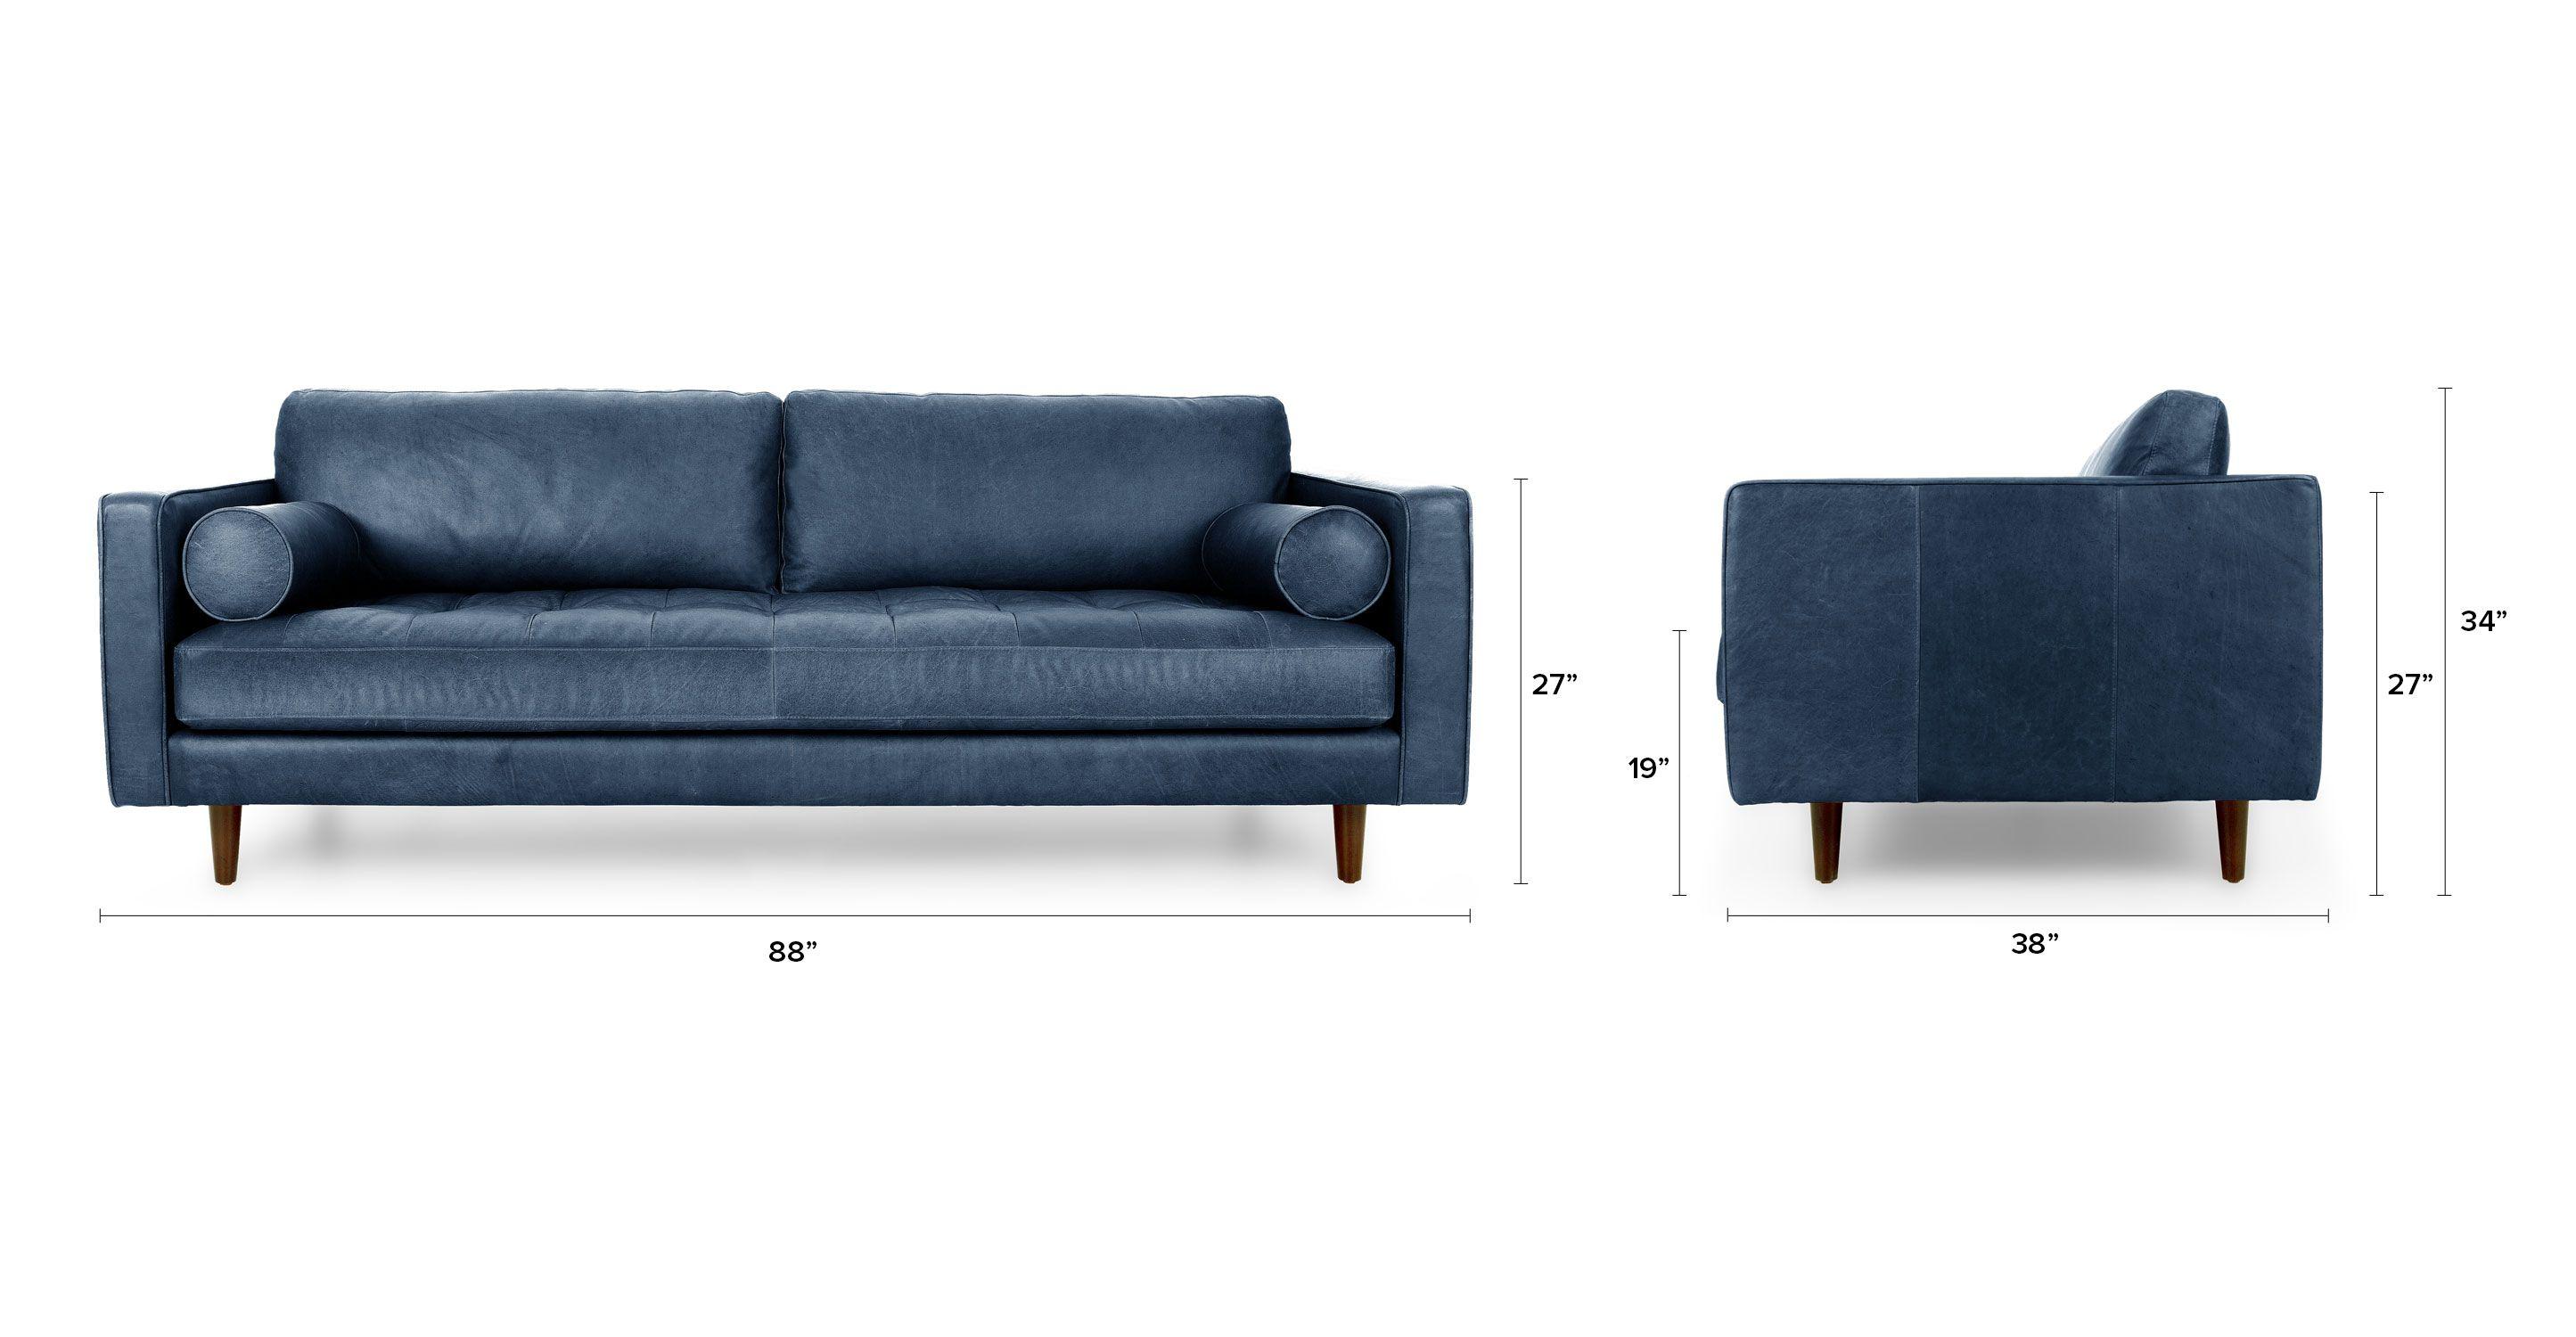 Blue Leather Tufted Sofa - Upholstered   Article Sven Modern ...